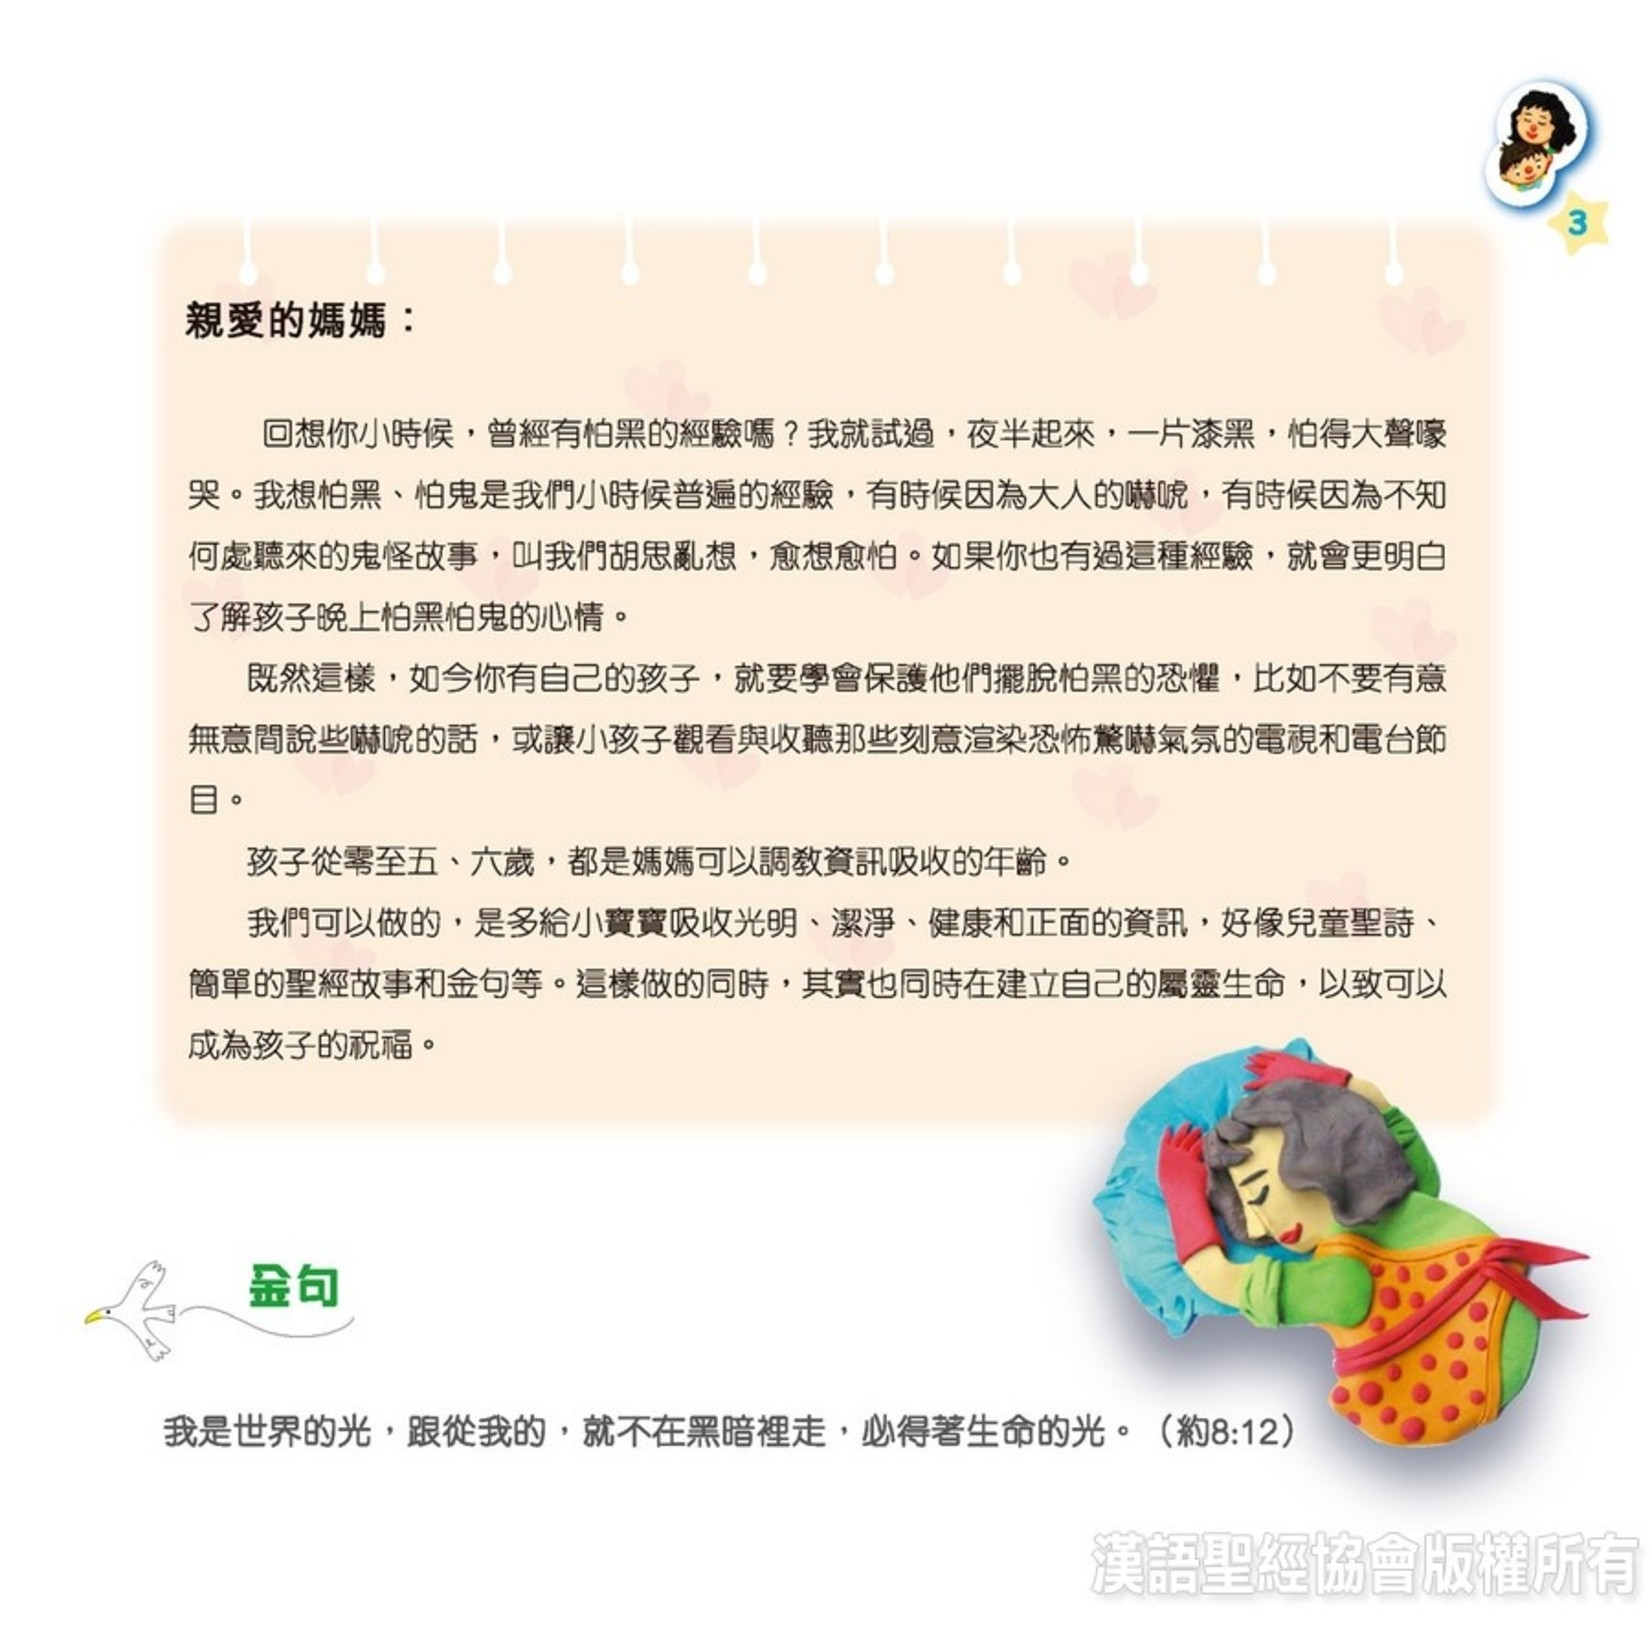 漢語聖經協會 Chinese Bible International 媽媽.媽咪:親子靈修 Quiet Time for Mother and Child